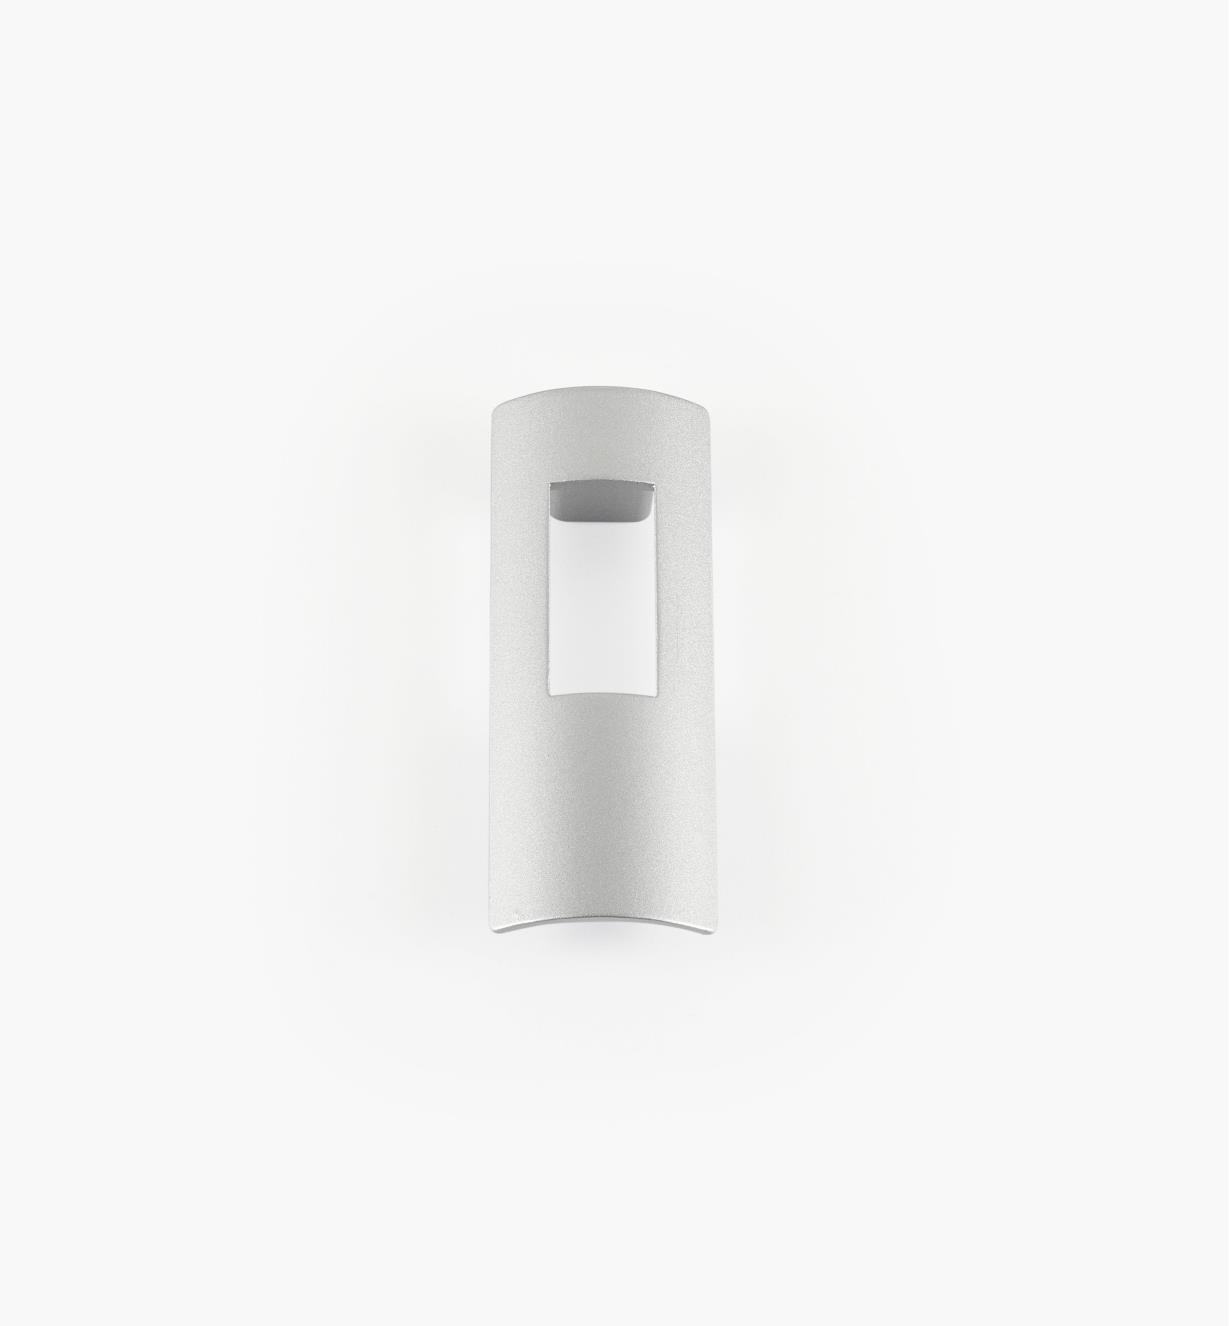 01G1932 - 64mm x 88mm Aluminum Portal Pull